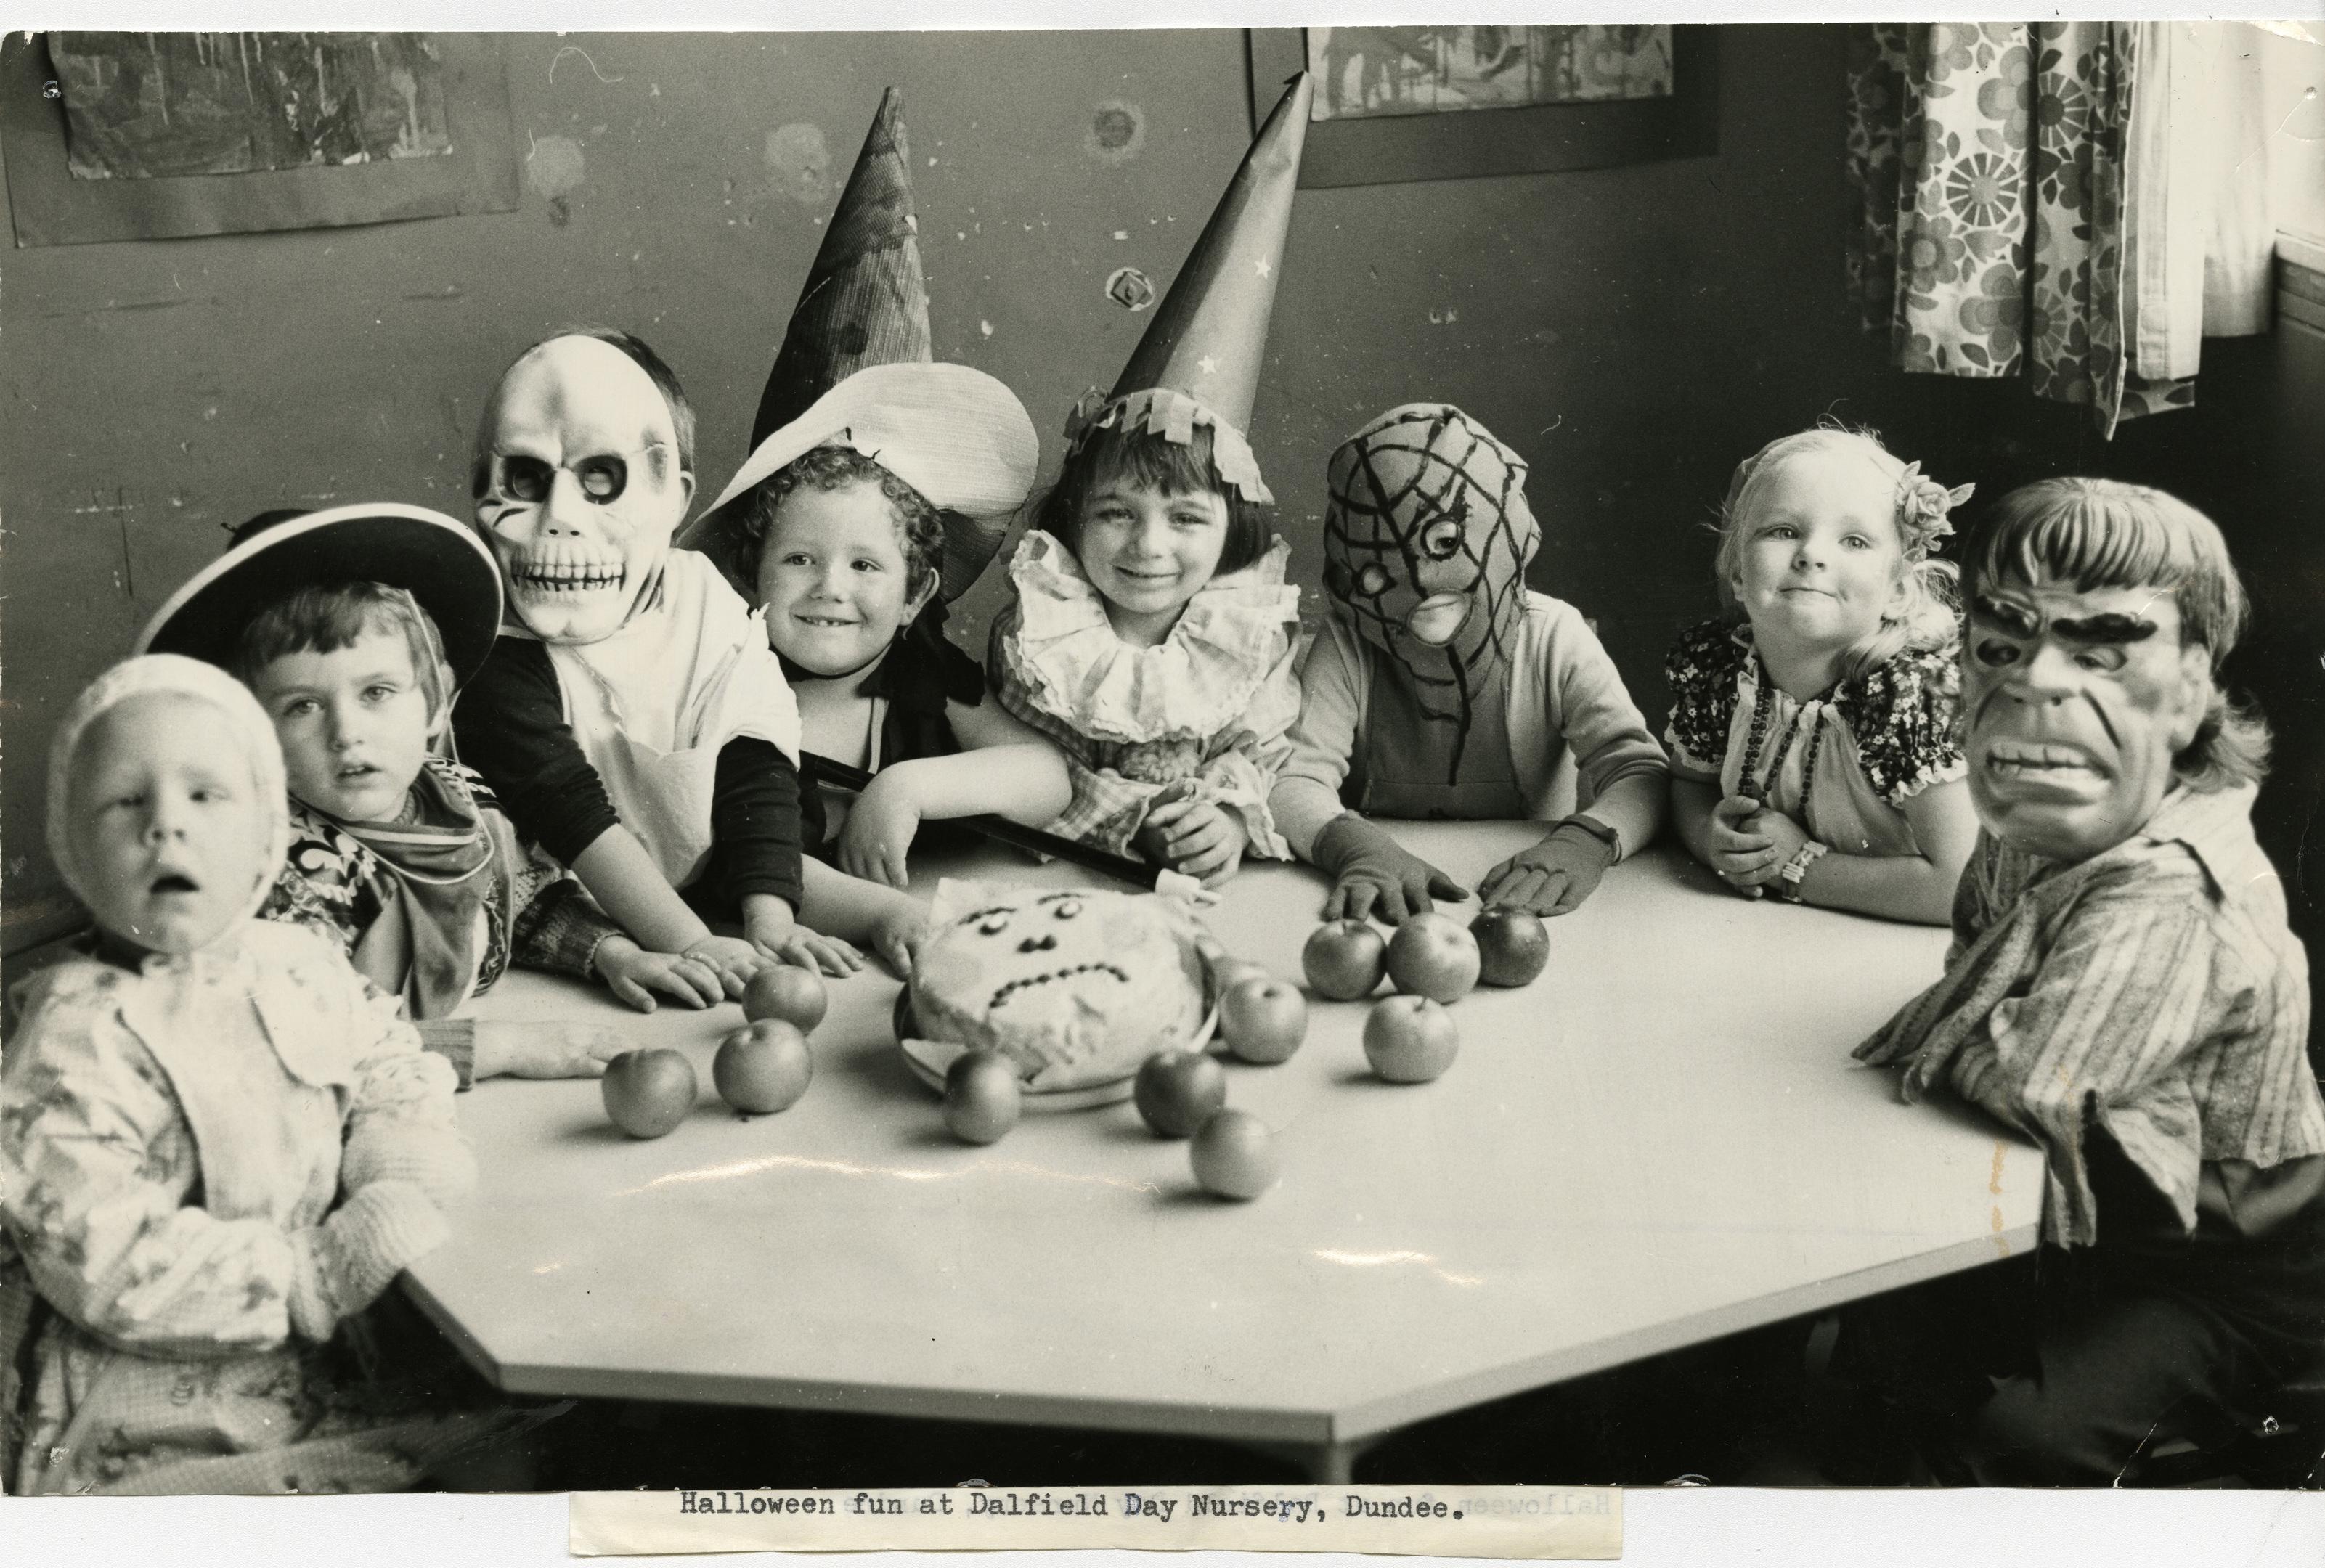 Children enjoying Halloween at Dallfield Day Nursery, Dundee. October 31, 1978.